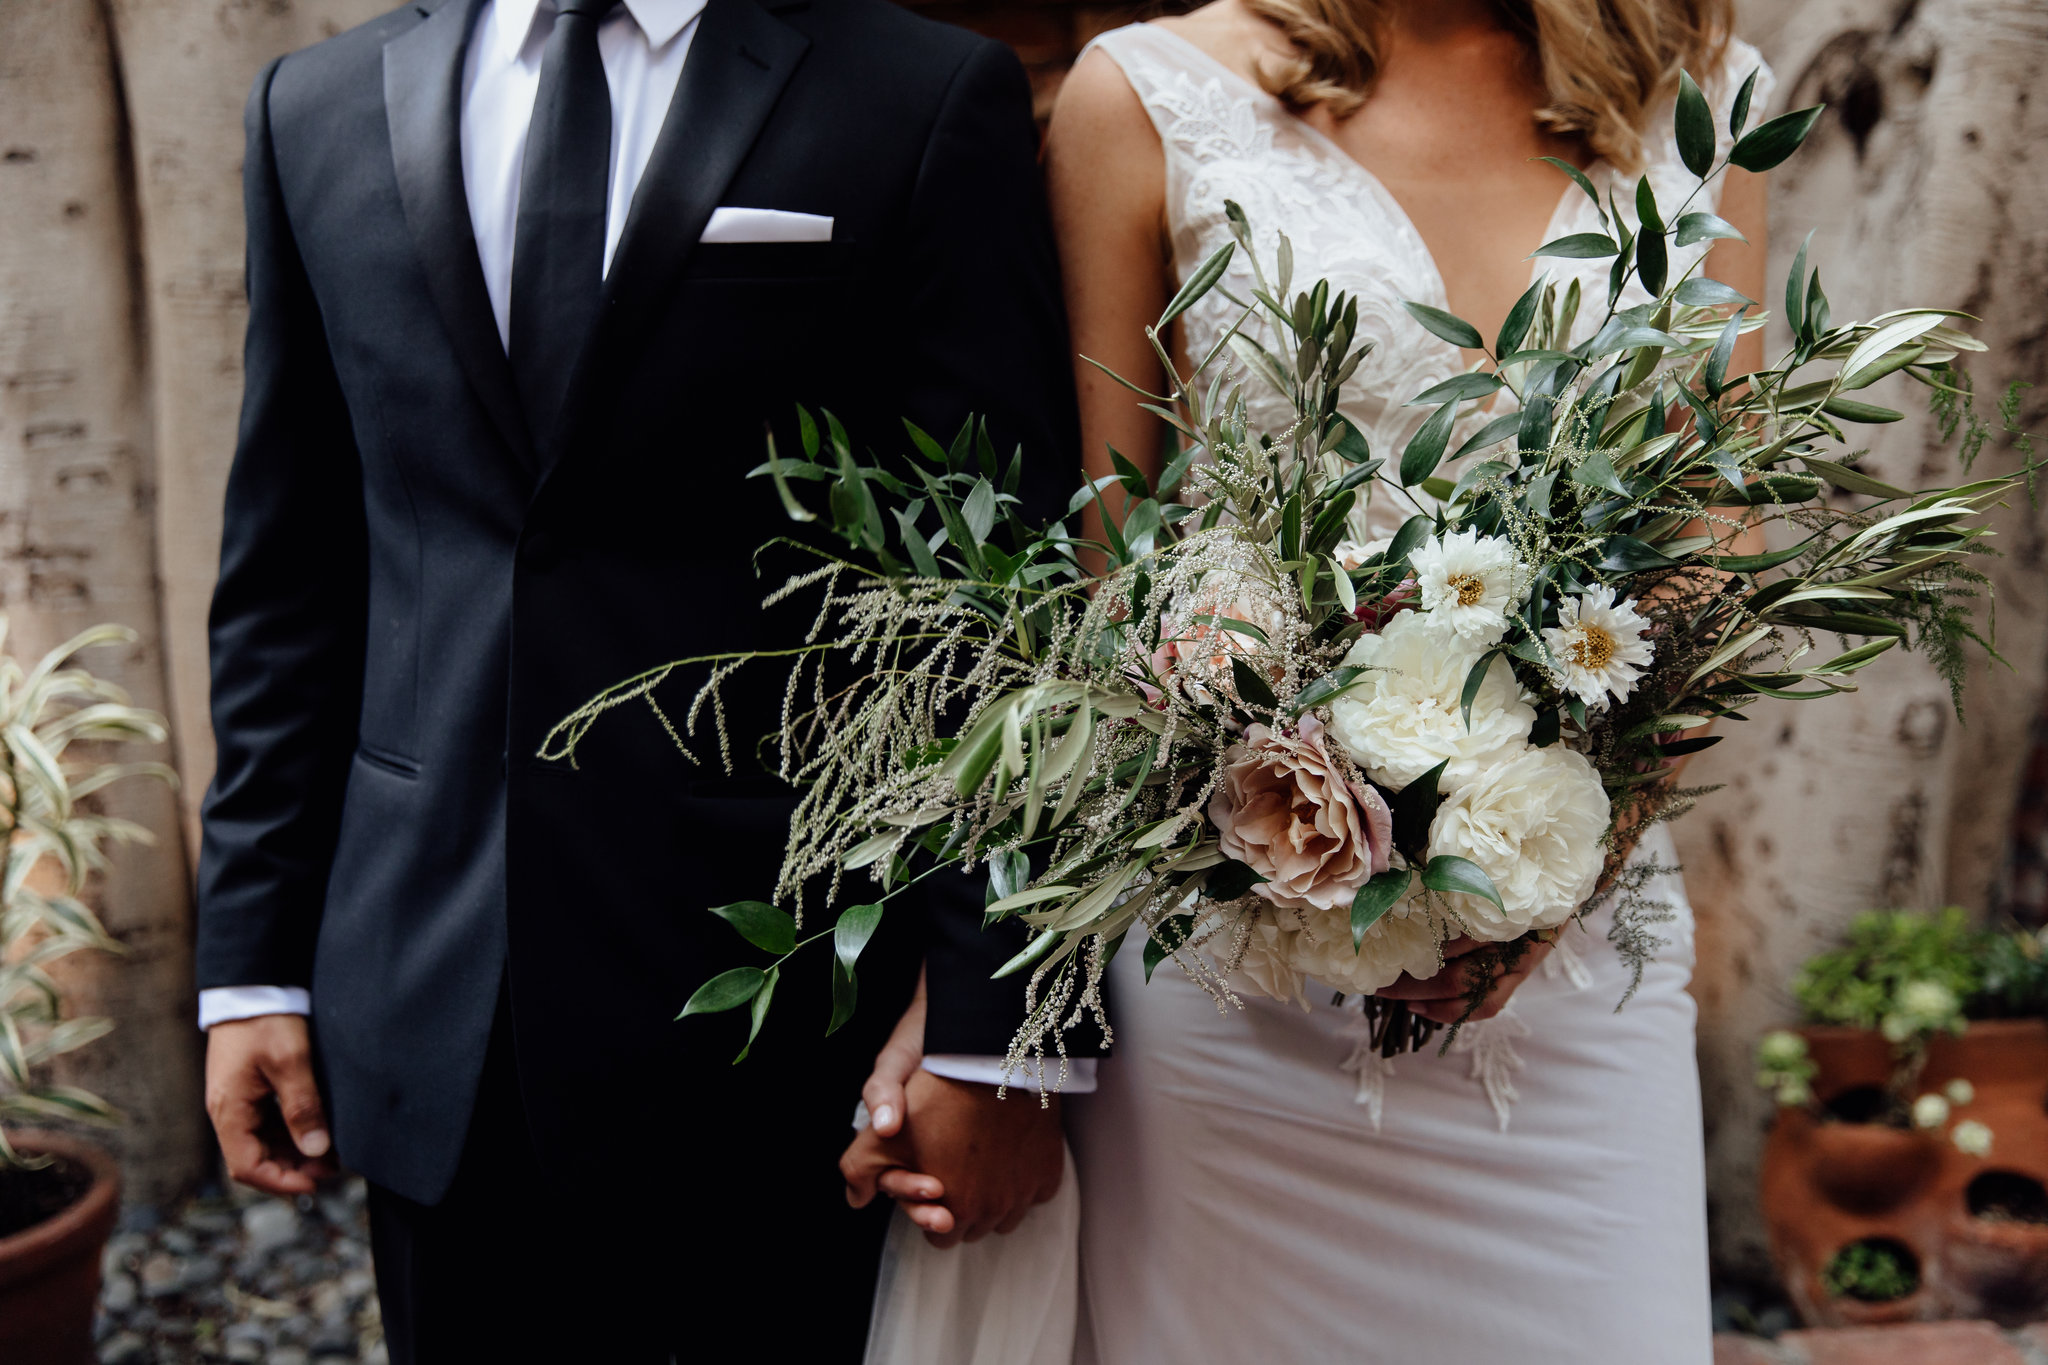 carondelet-los-angeles-wedding-marble-rye-photography-firstlook-portraits-067.jpg